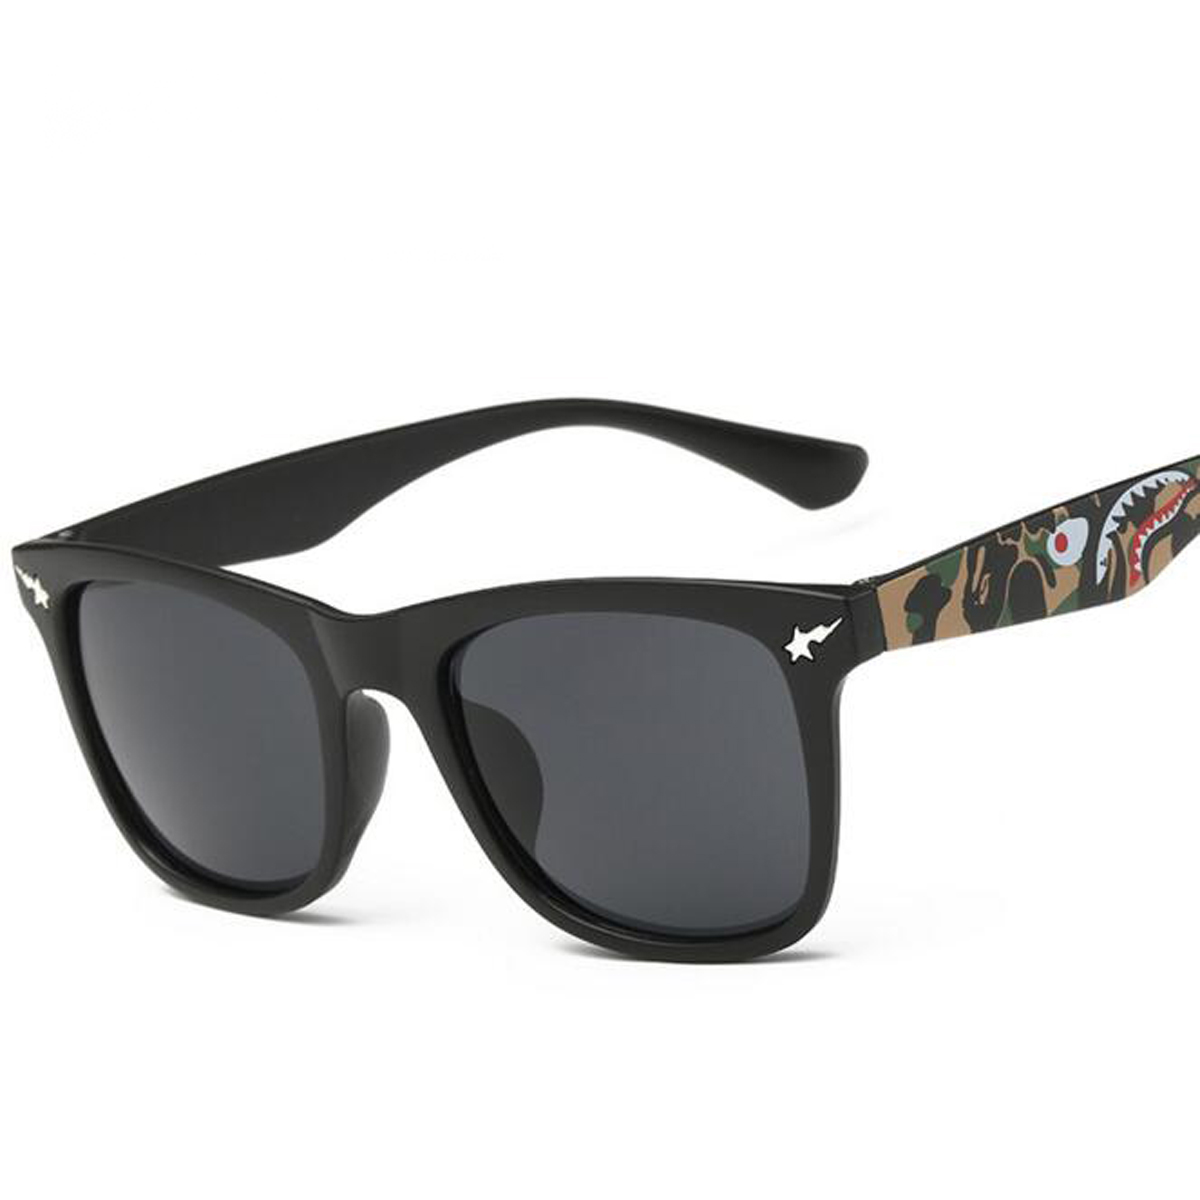 men women vintage camo frame sunglasses feminino unisex gafas de sol mujer mirrored lens sport eyewear